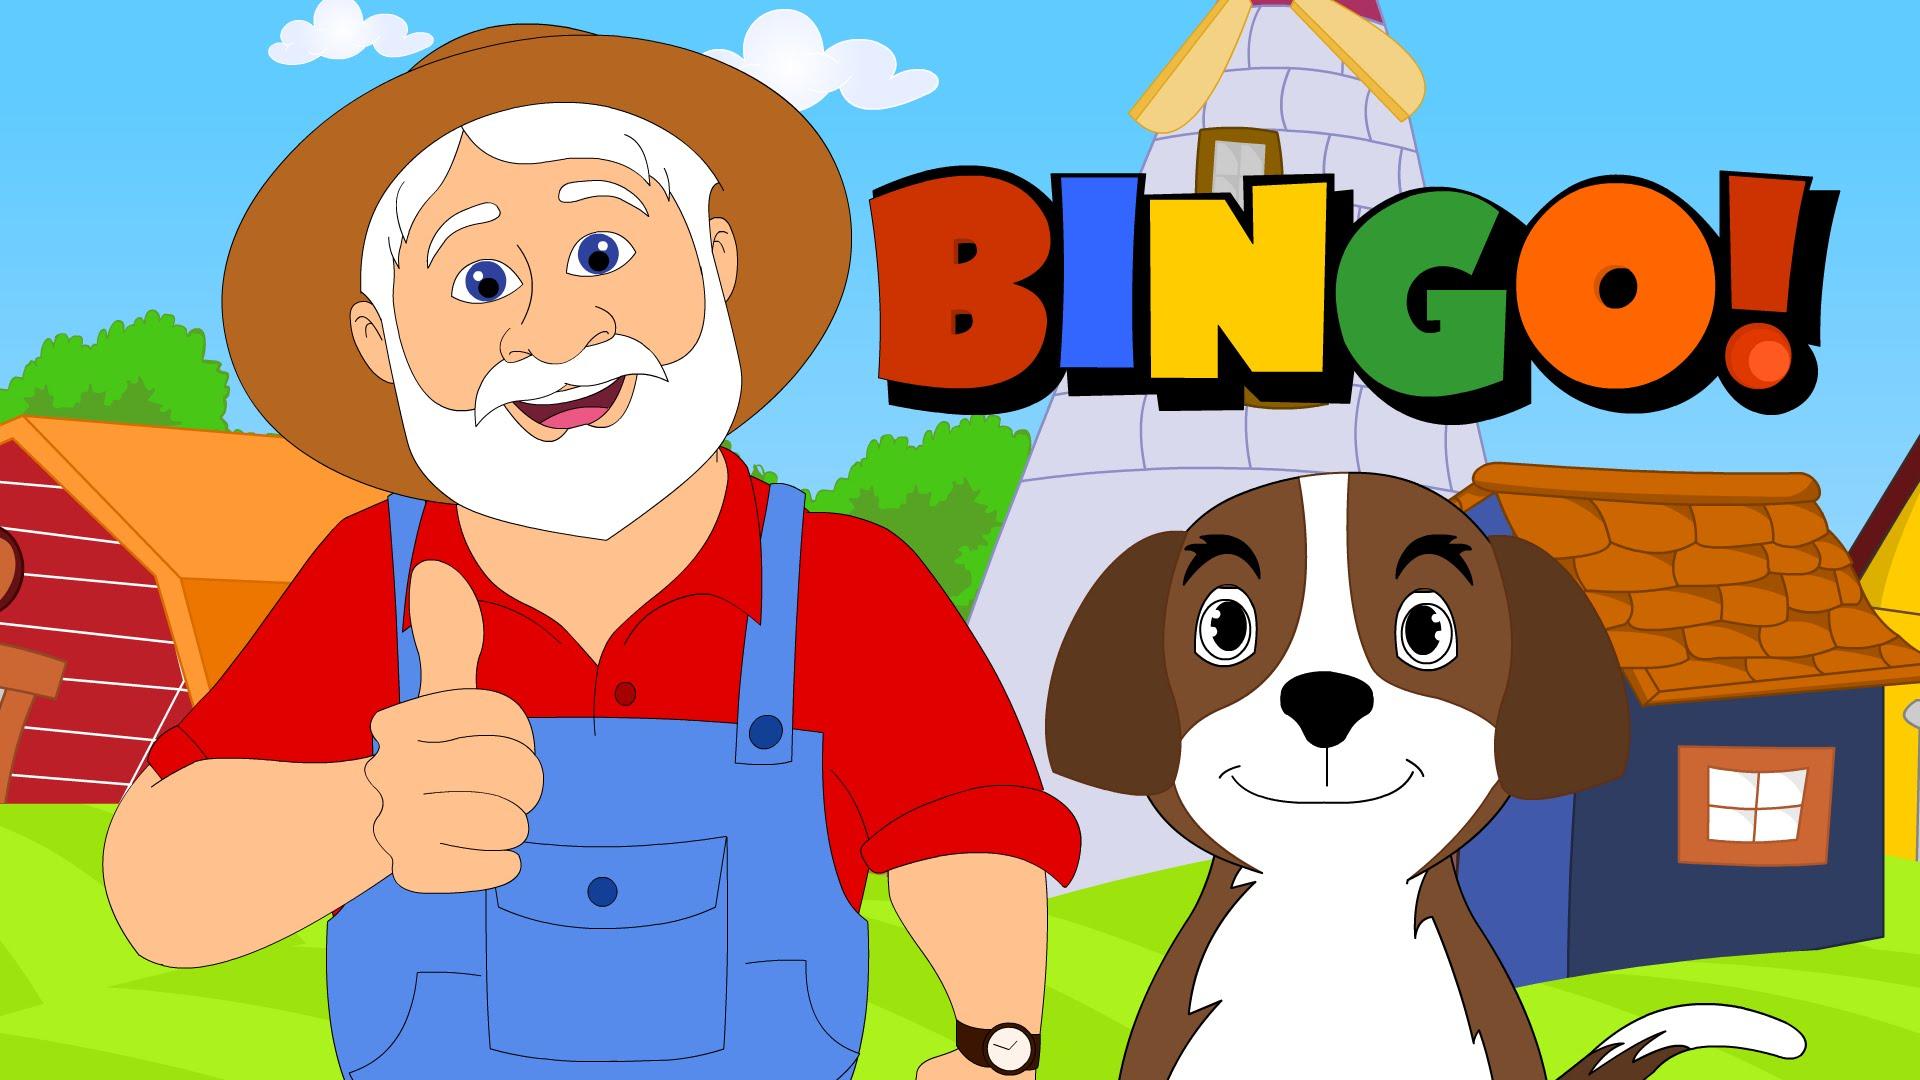 Dog song nursery rhymes. Bingo clipart children's